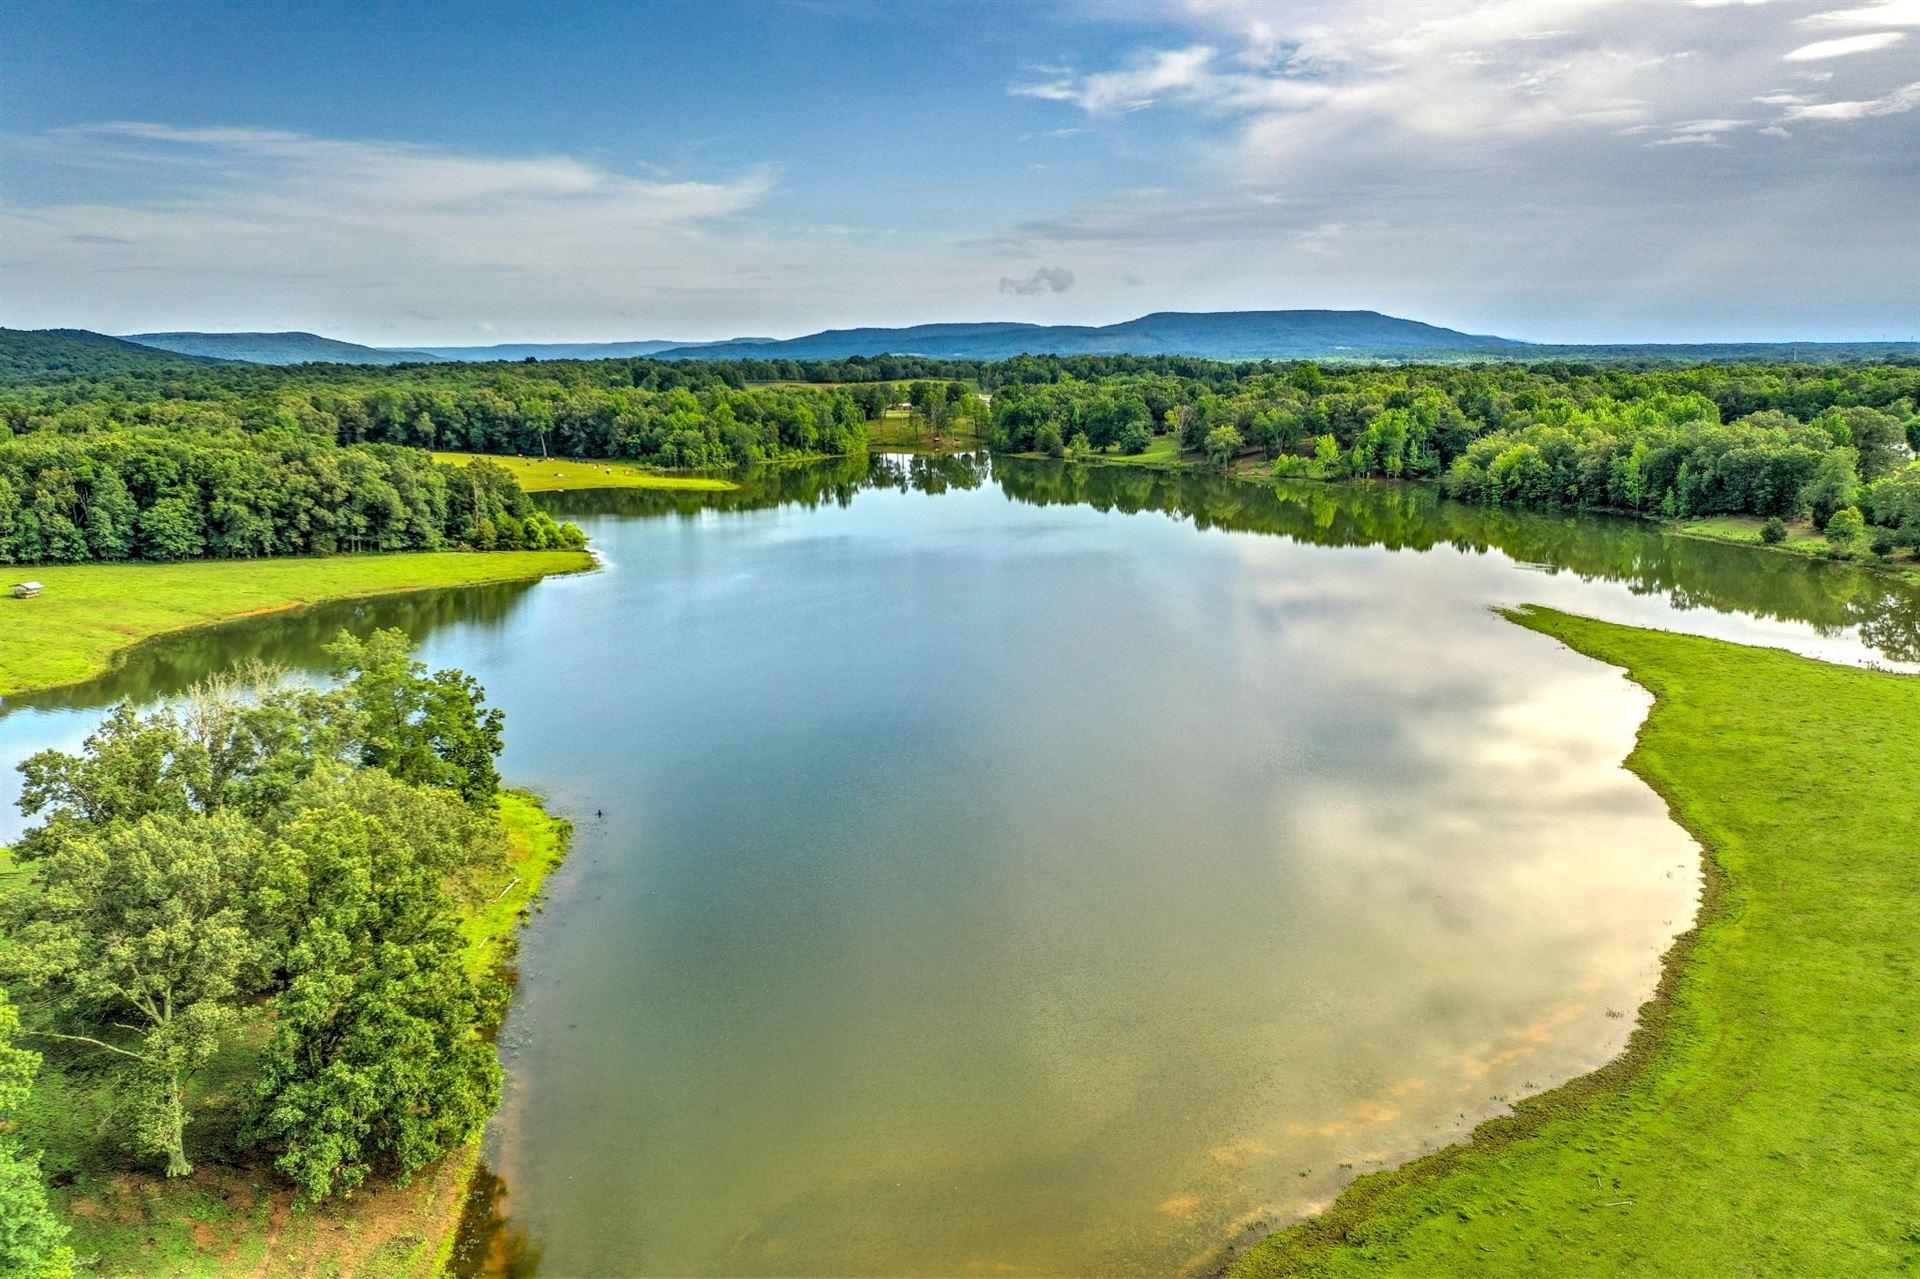 242 Lake Karen Rd, Mc Minnville, TN 37110 - MLS#: 2218578